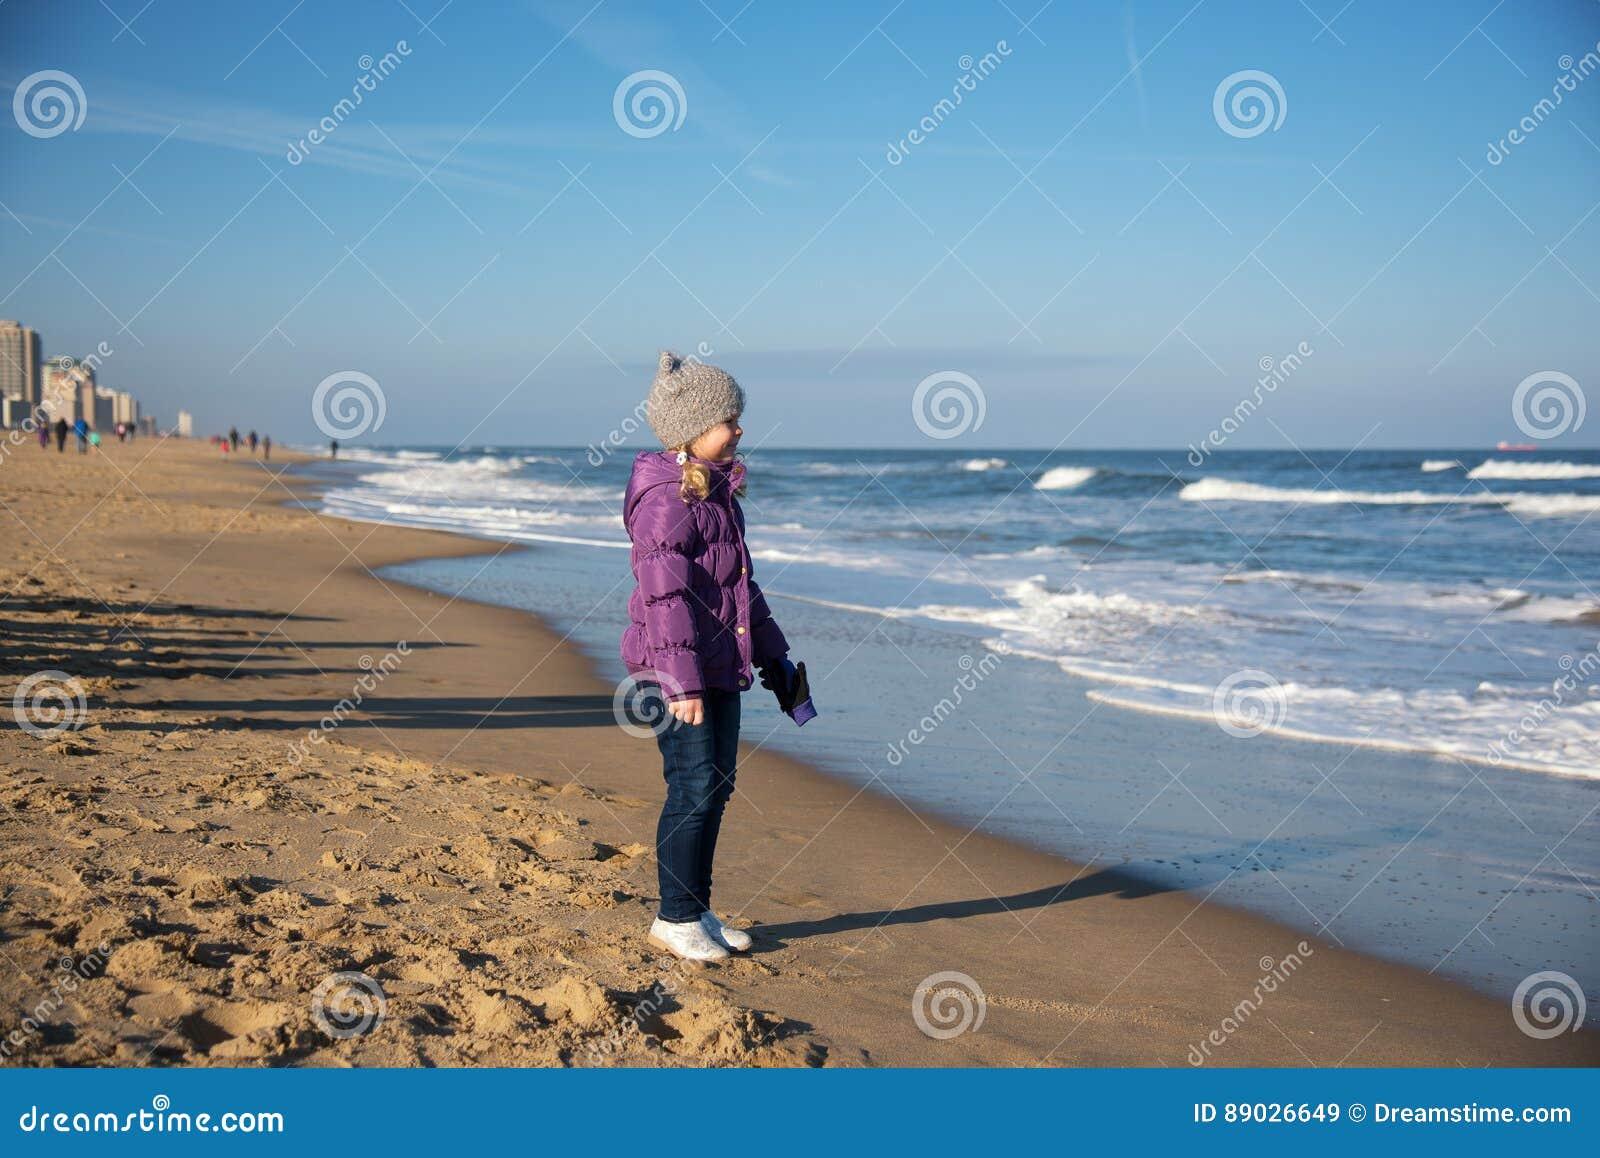 The expert, Girl in virginia beach